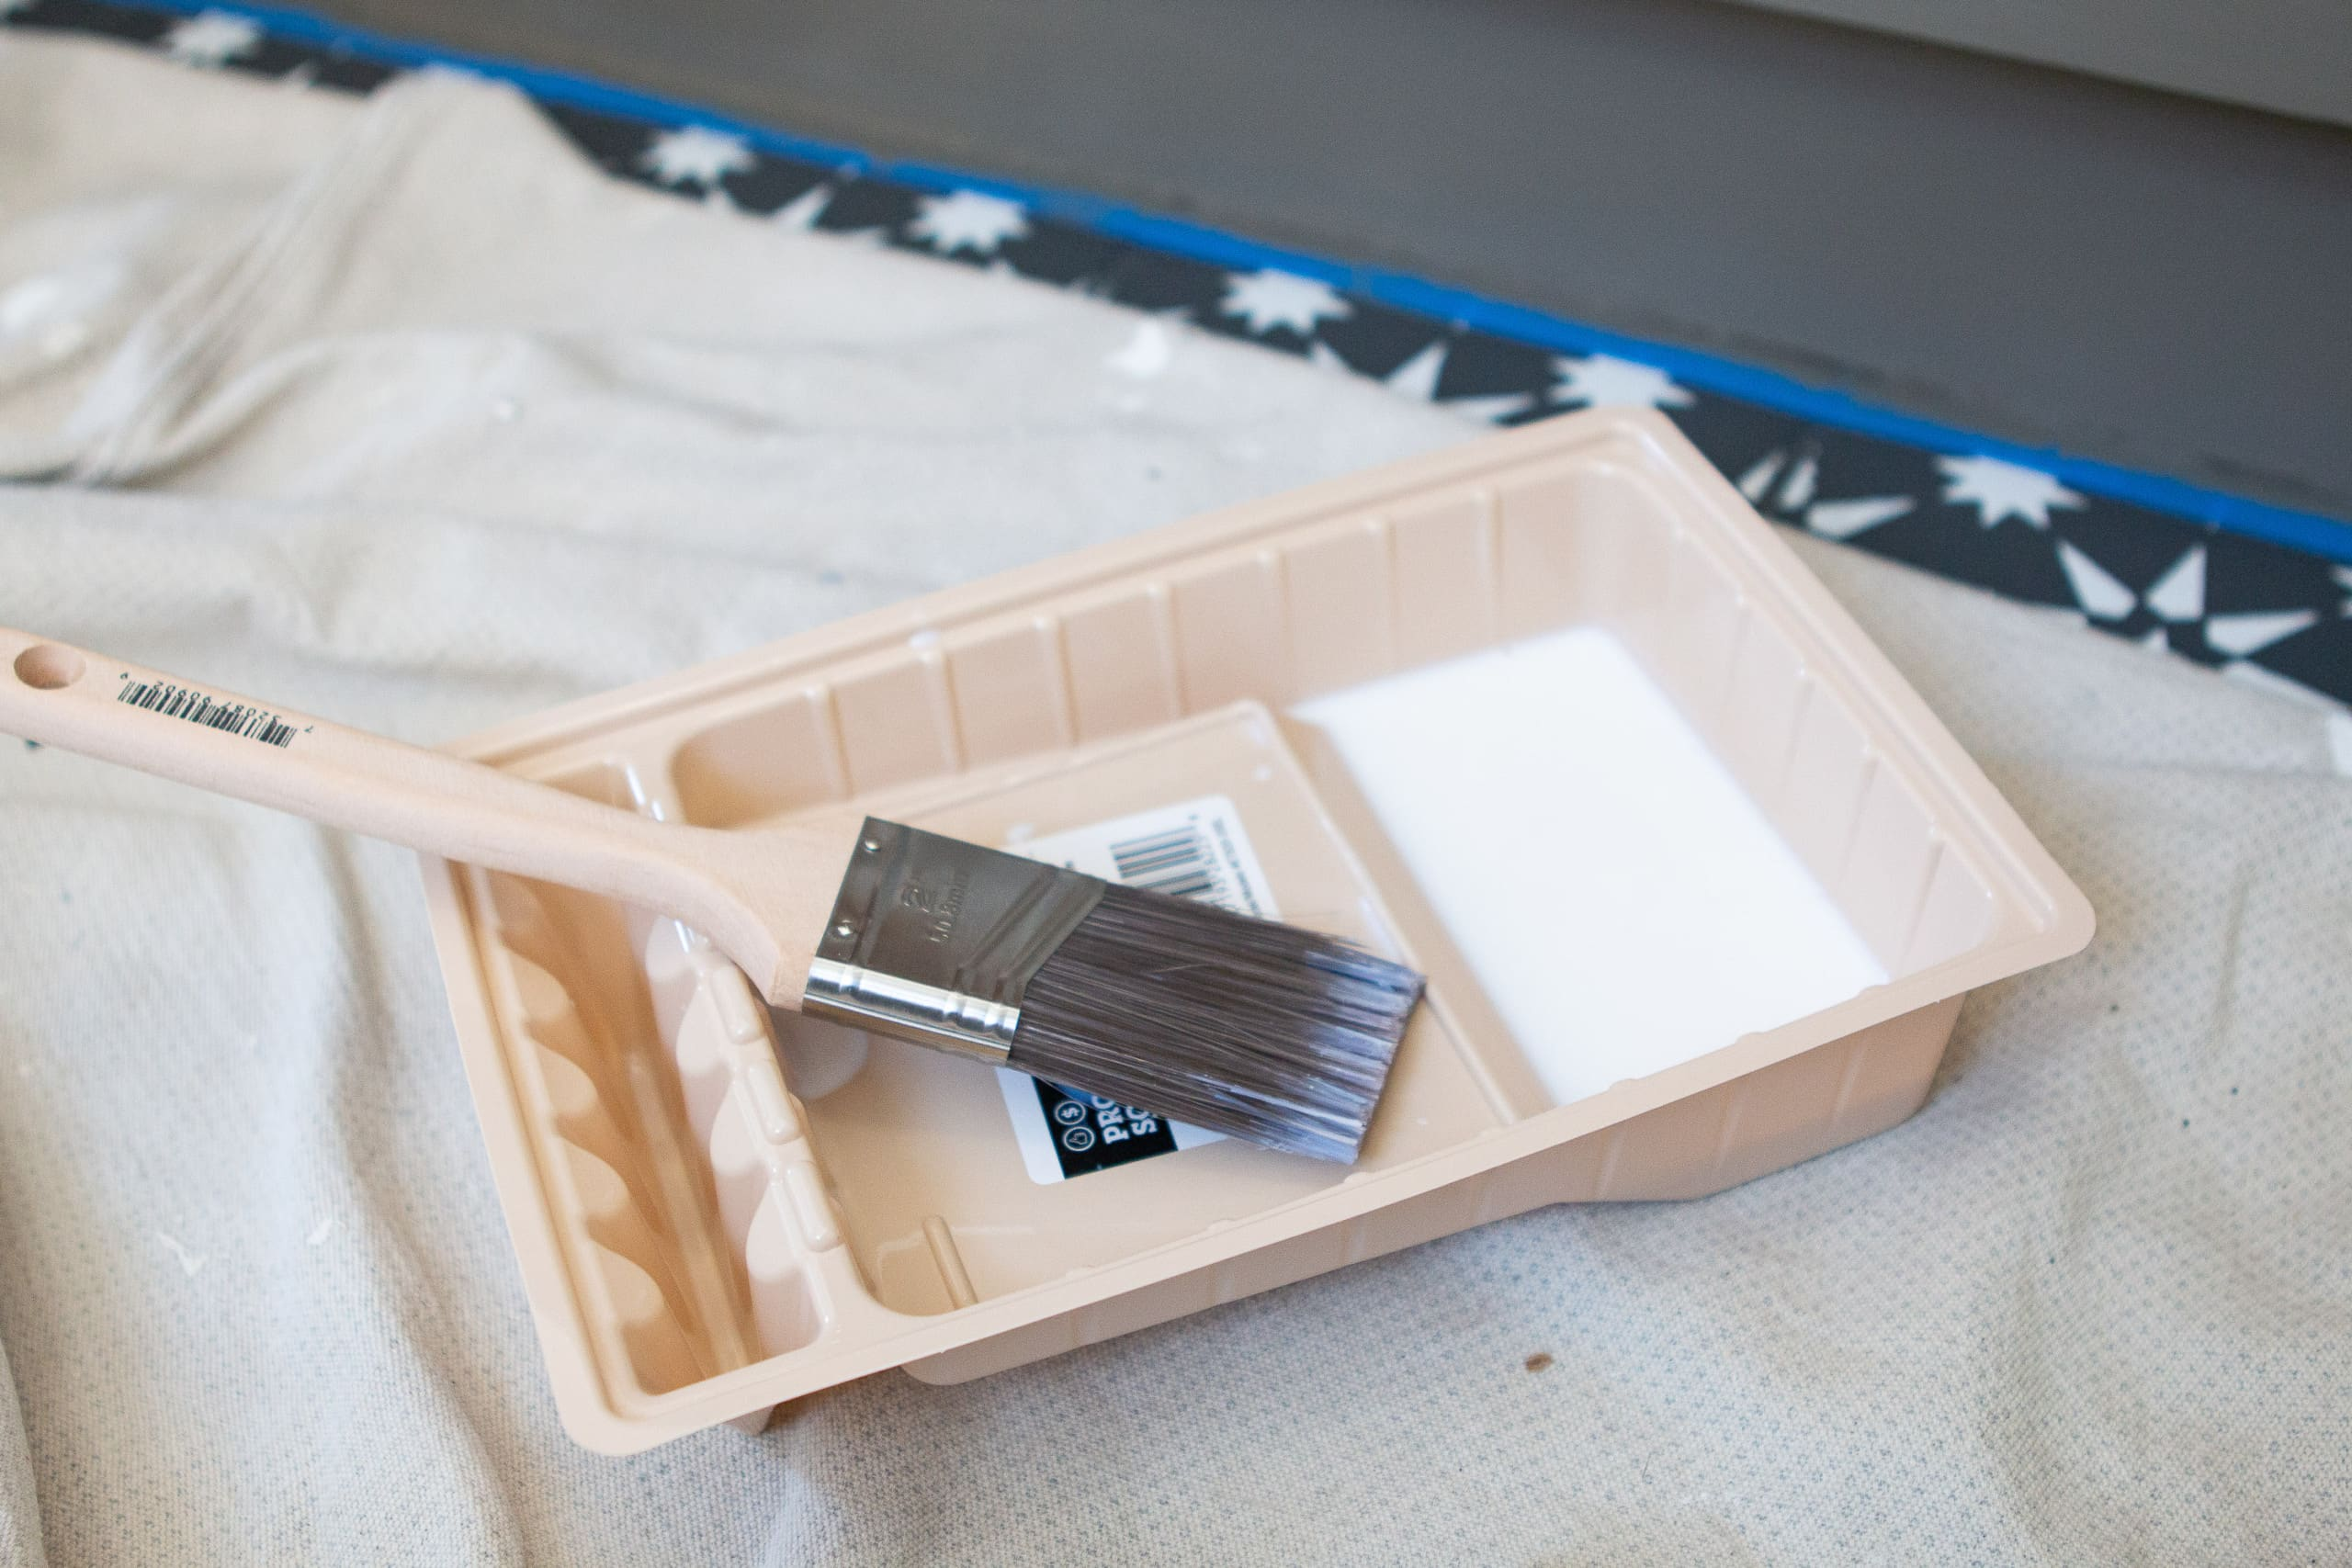 Supplies to paint your bathroom vanity